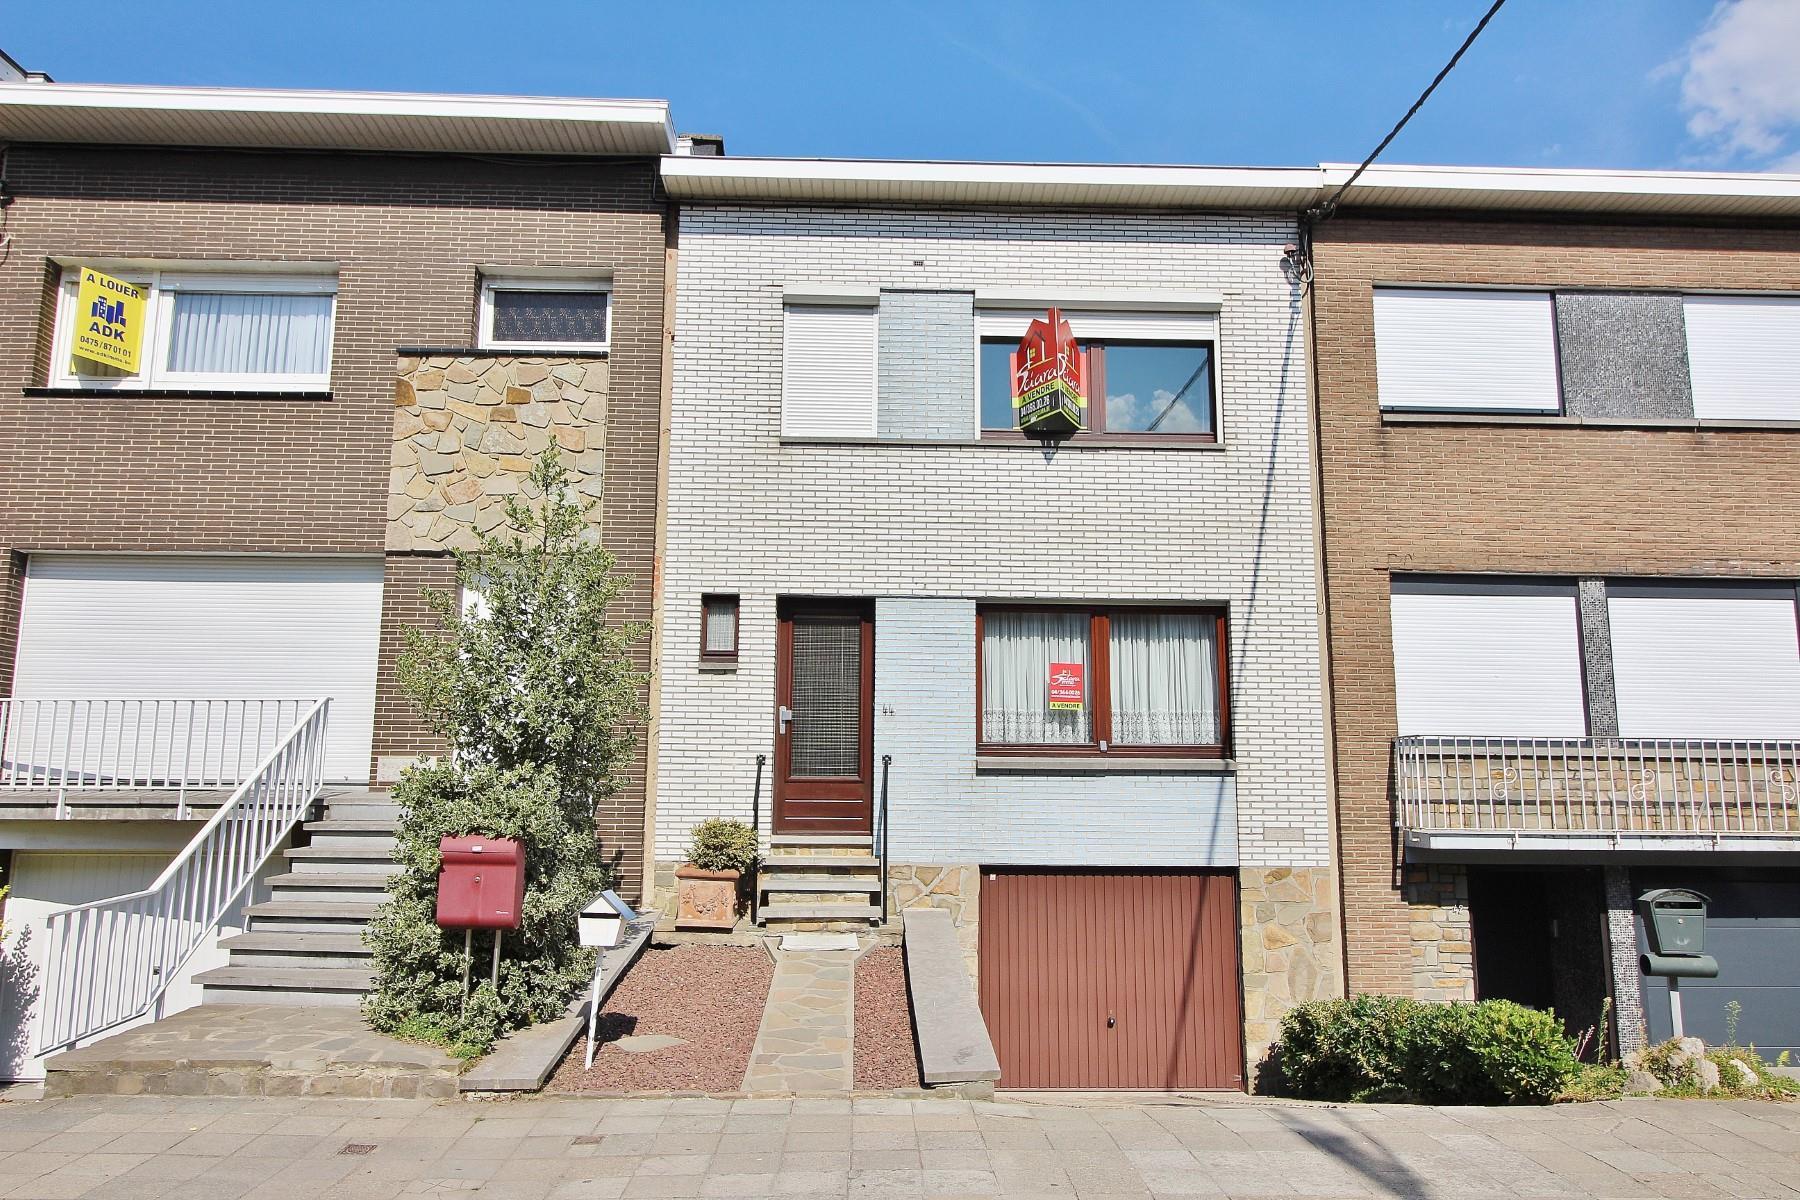 Maison - Liège Chênée - #3517923-25